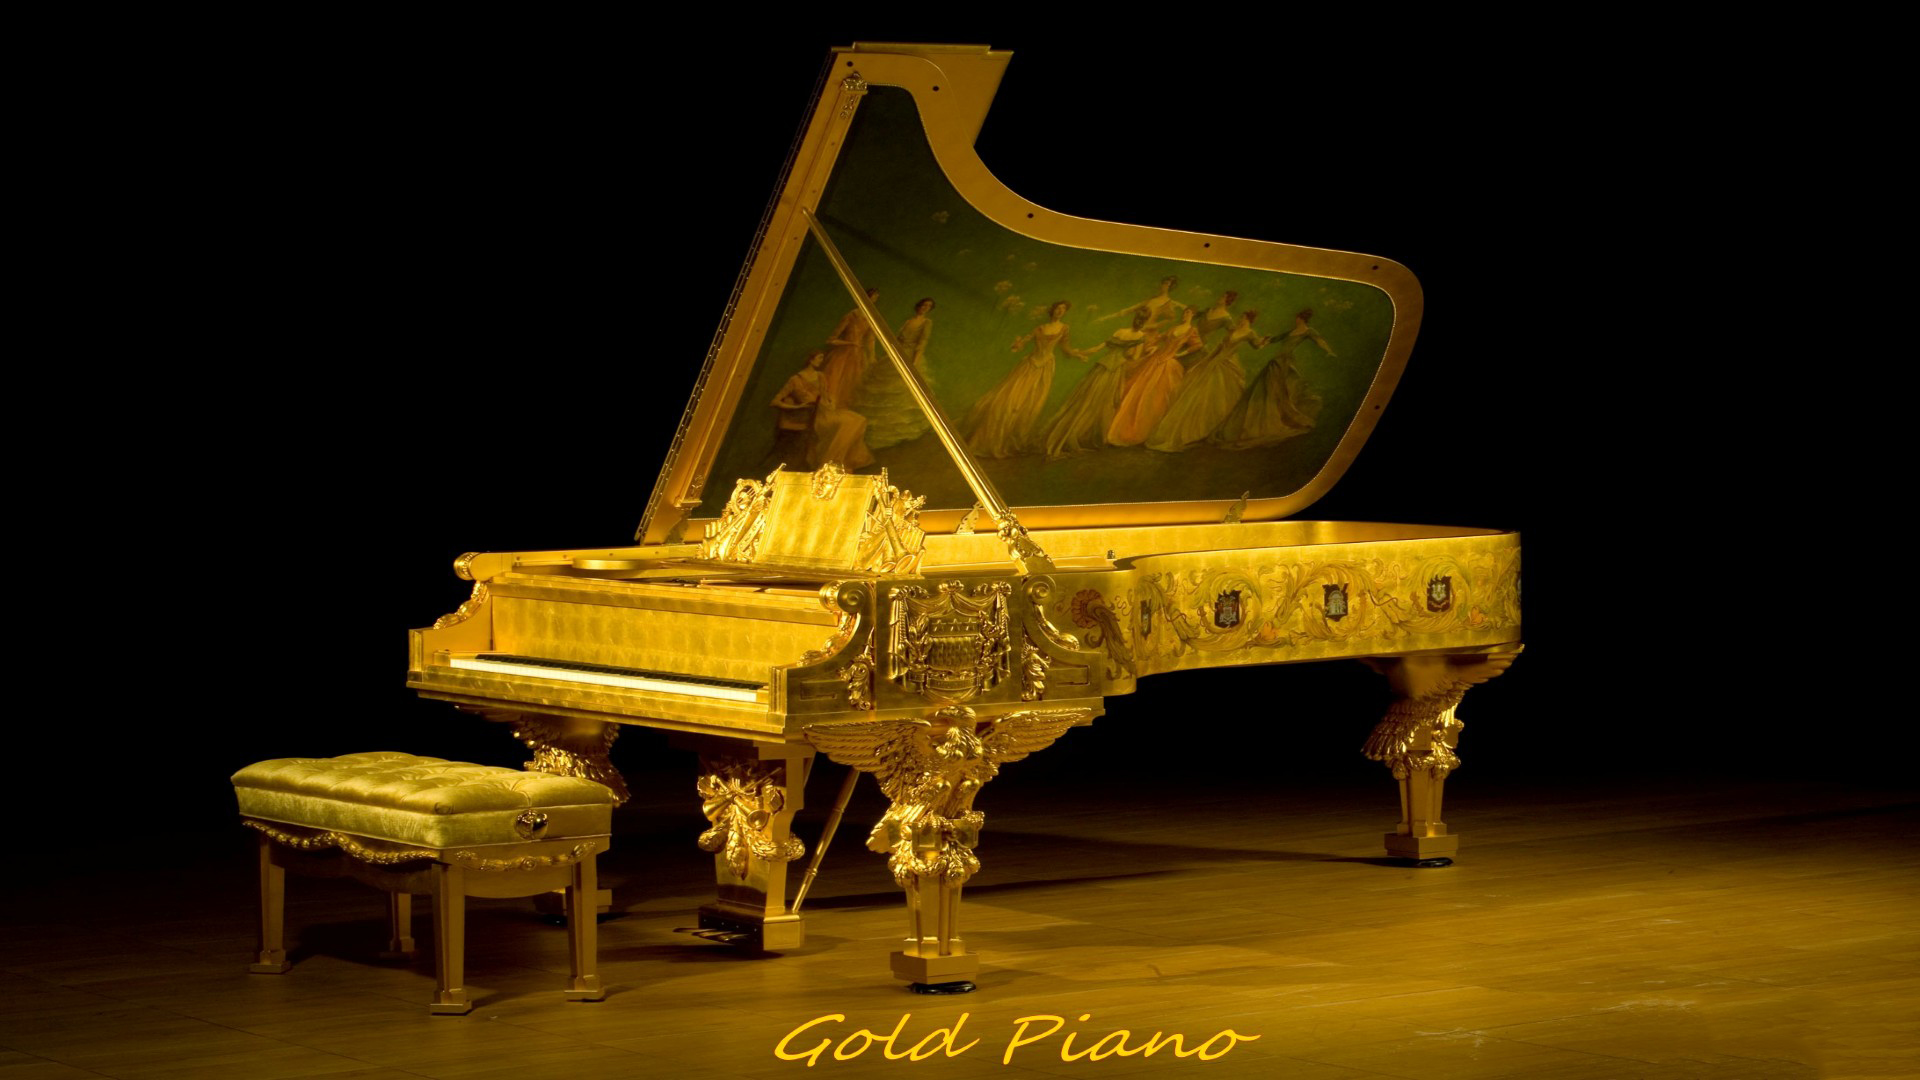 HD Piano Wallpaper 1920x1080